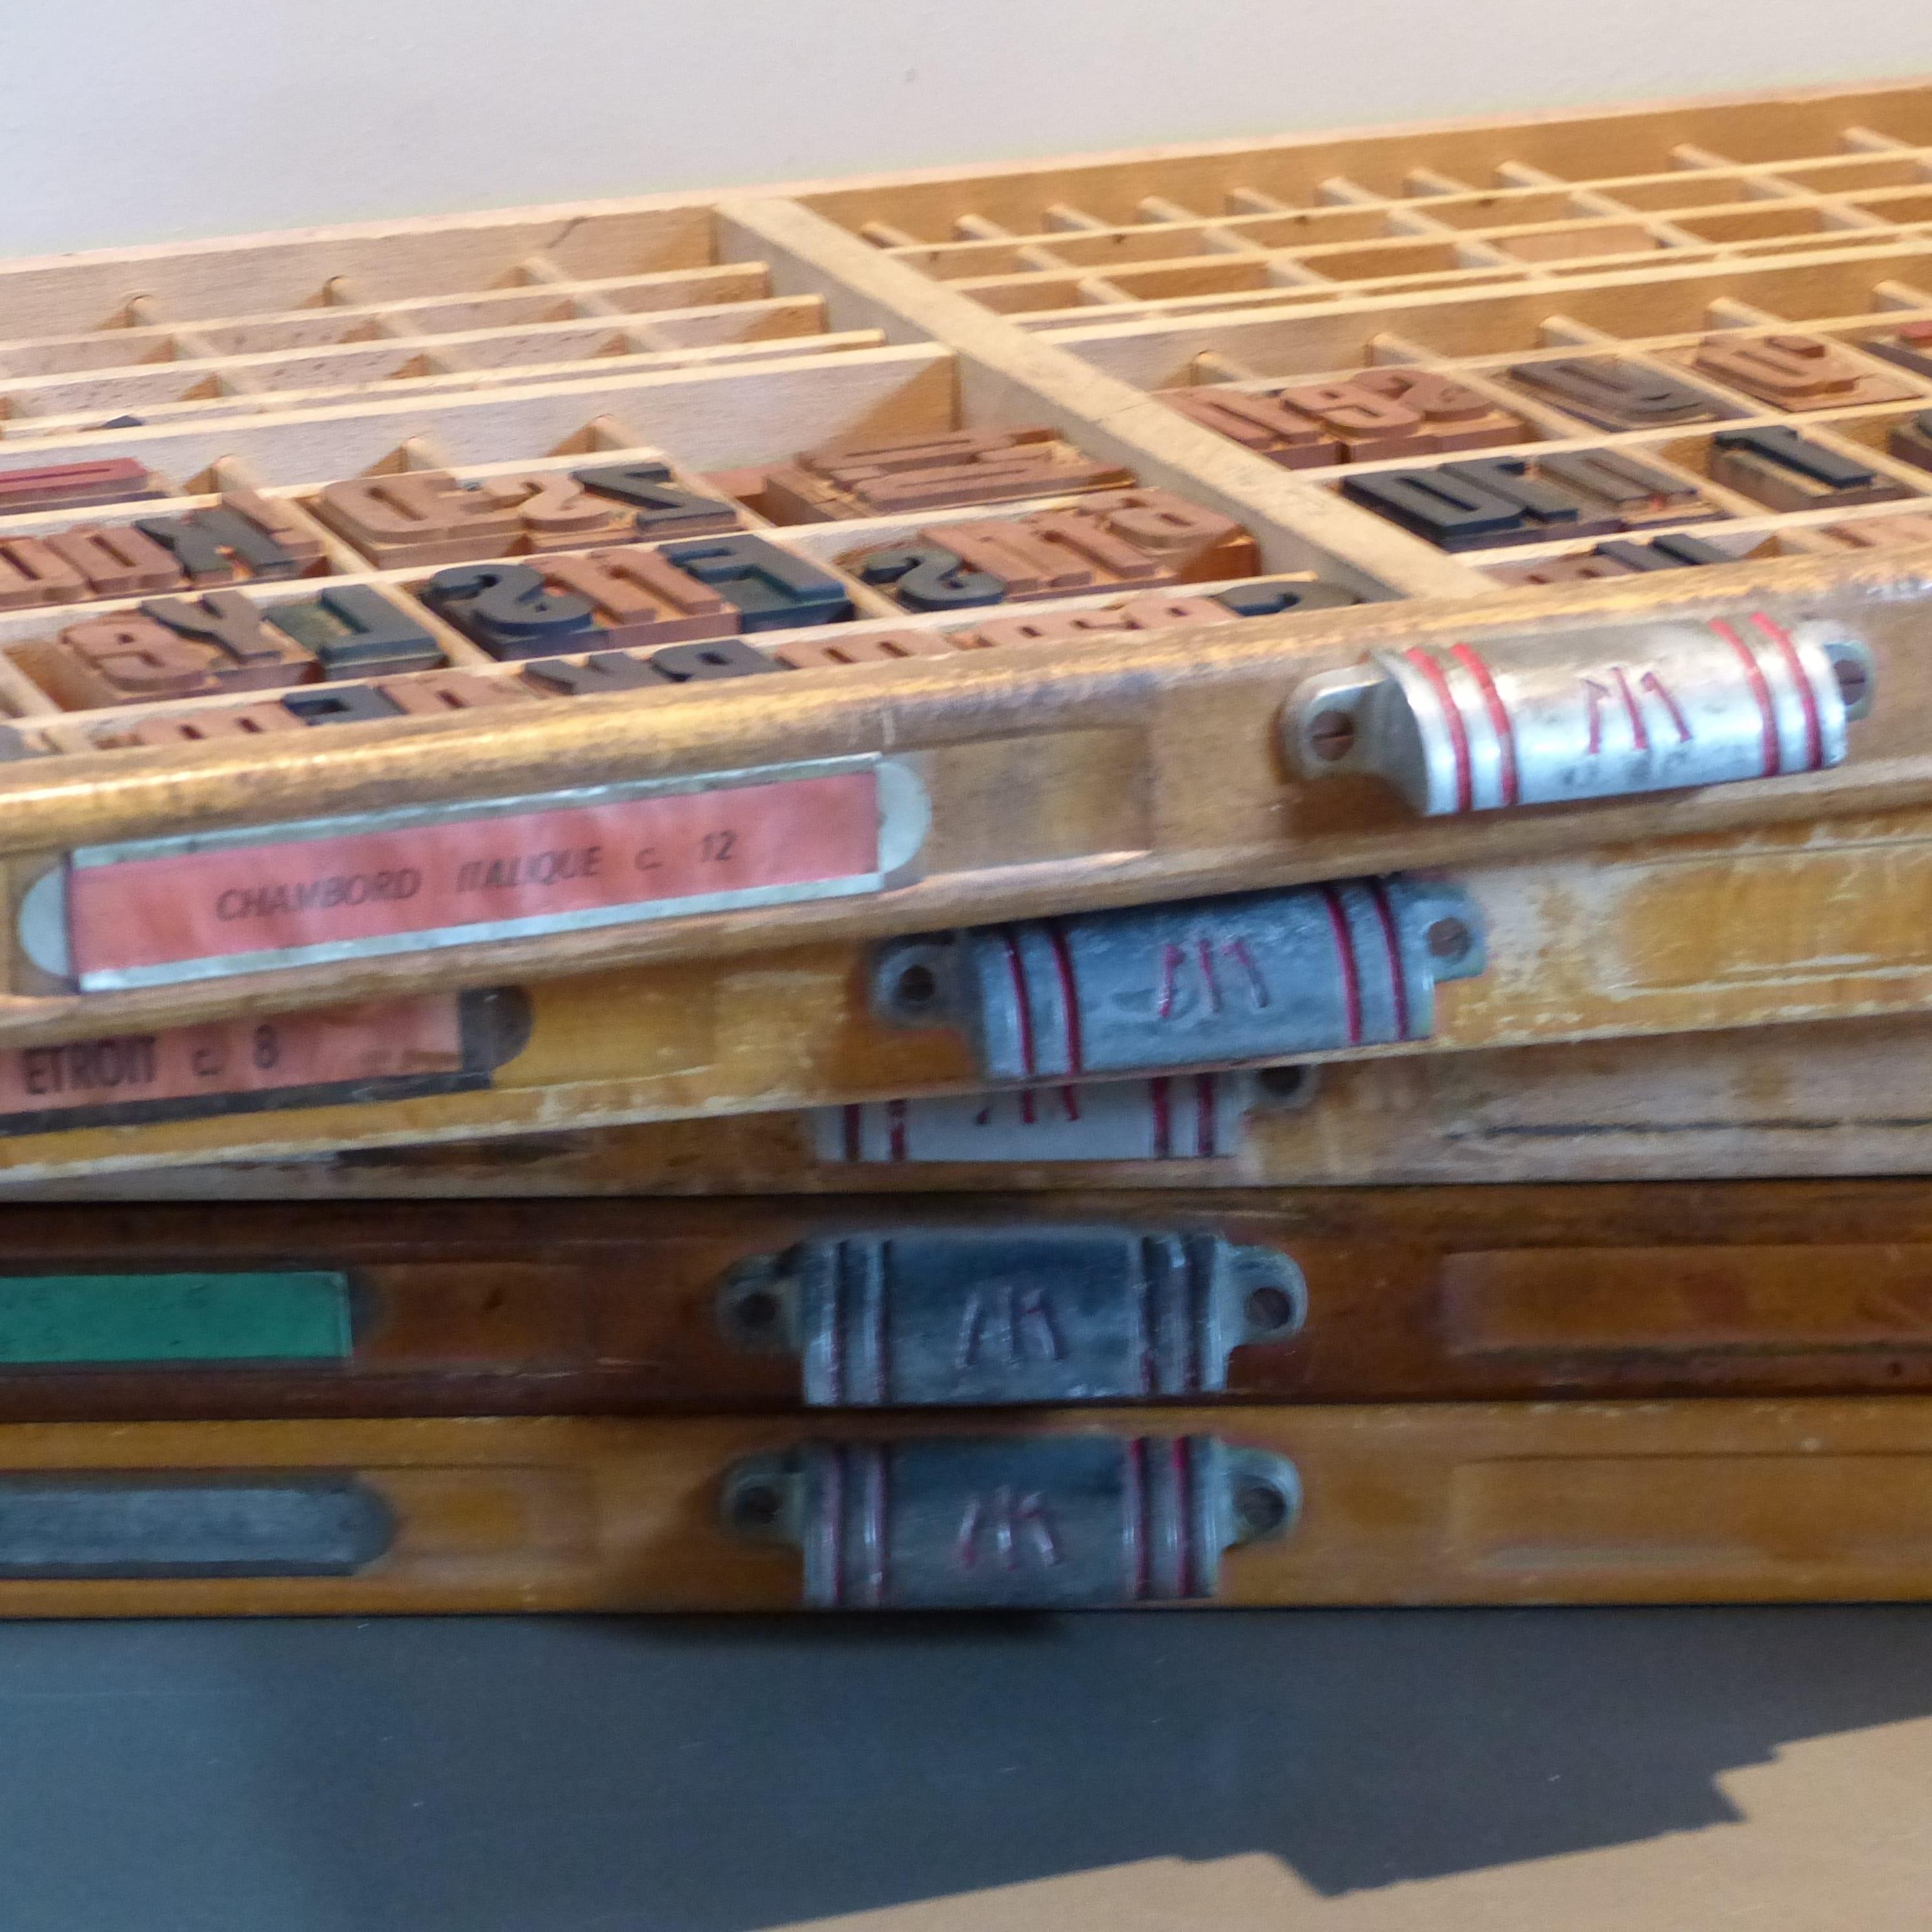 Tiroir de meuble d 39 imprimerie en bois lignedebrocante for Meuble bois tiroirs casiers